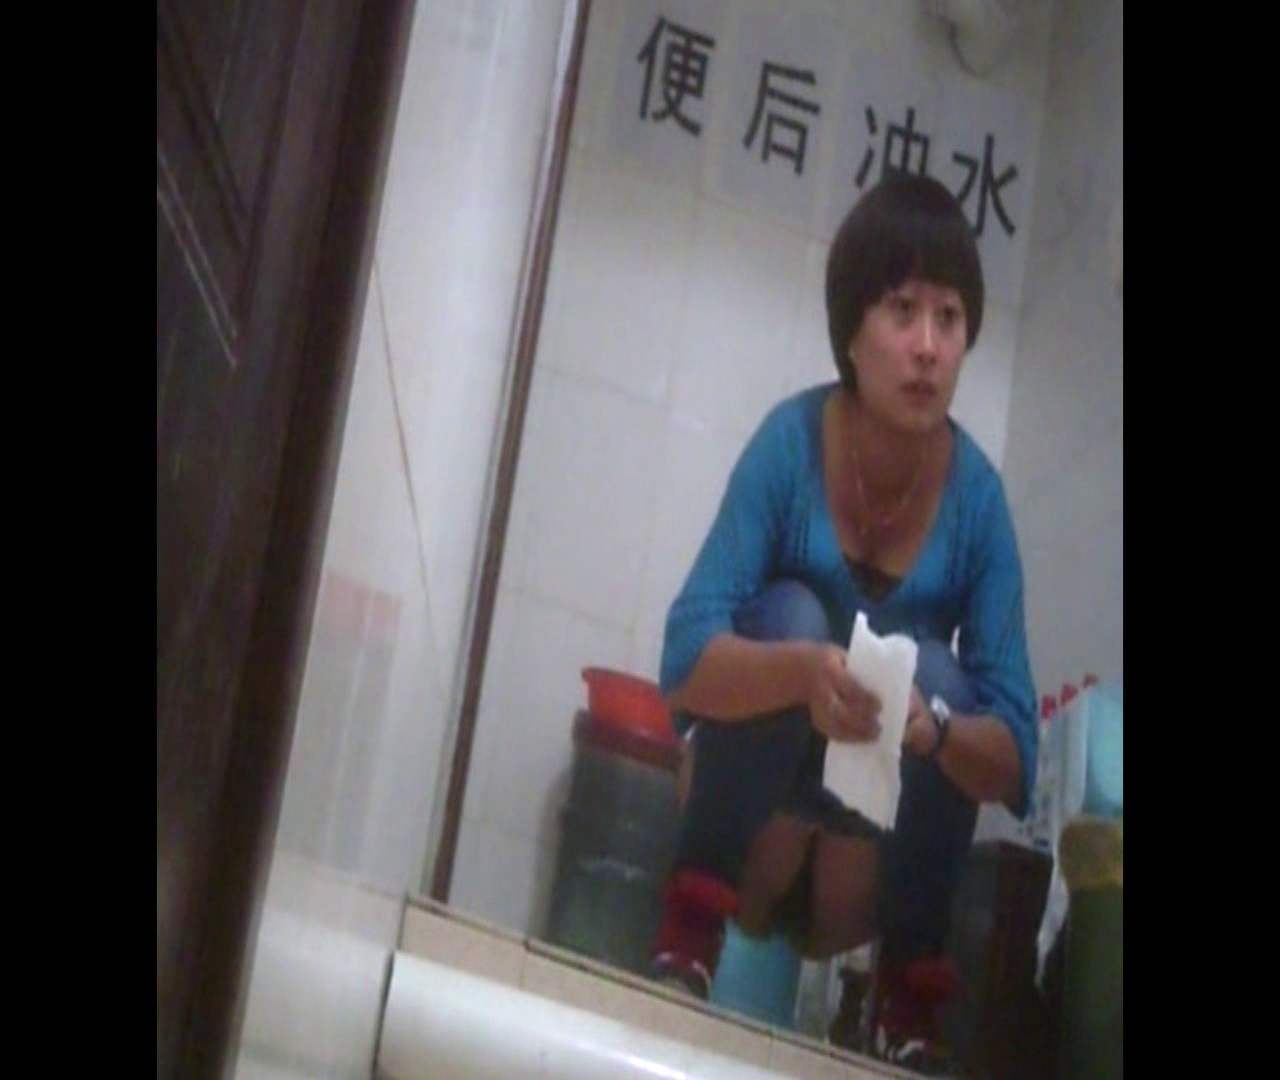 Vol.37 豊満な胸を持つマッシュルームカットな彼女 洗面所のぞき 性交動画流出 109枚 59